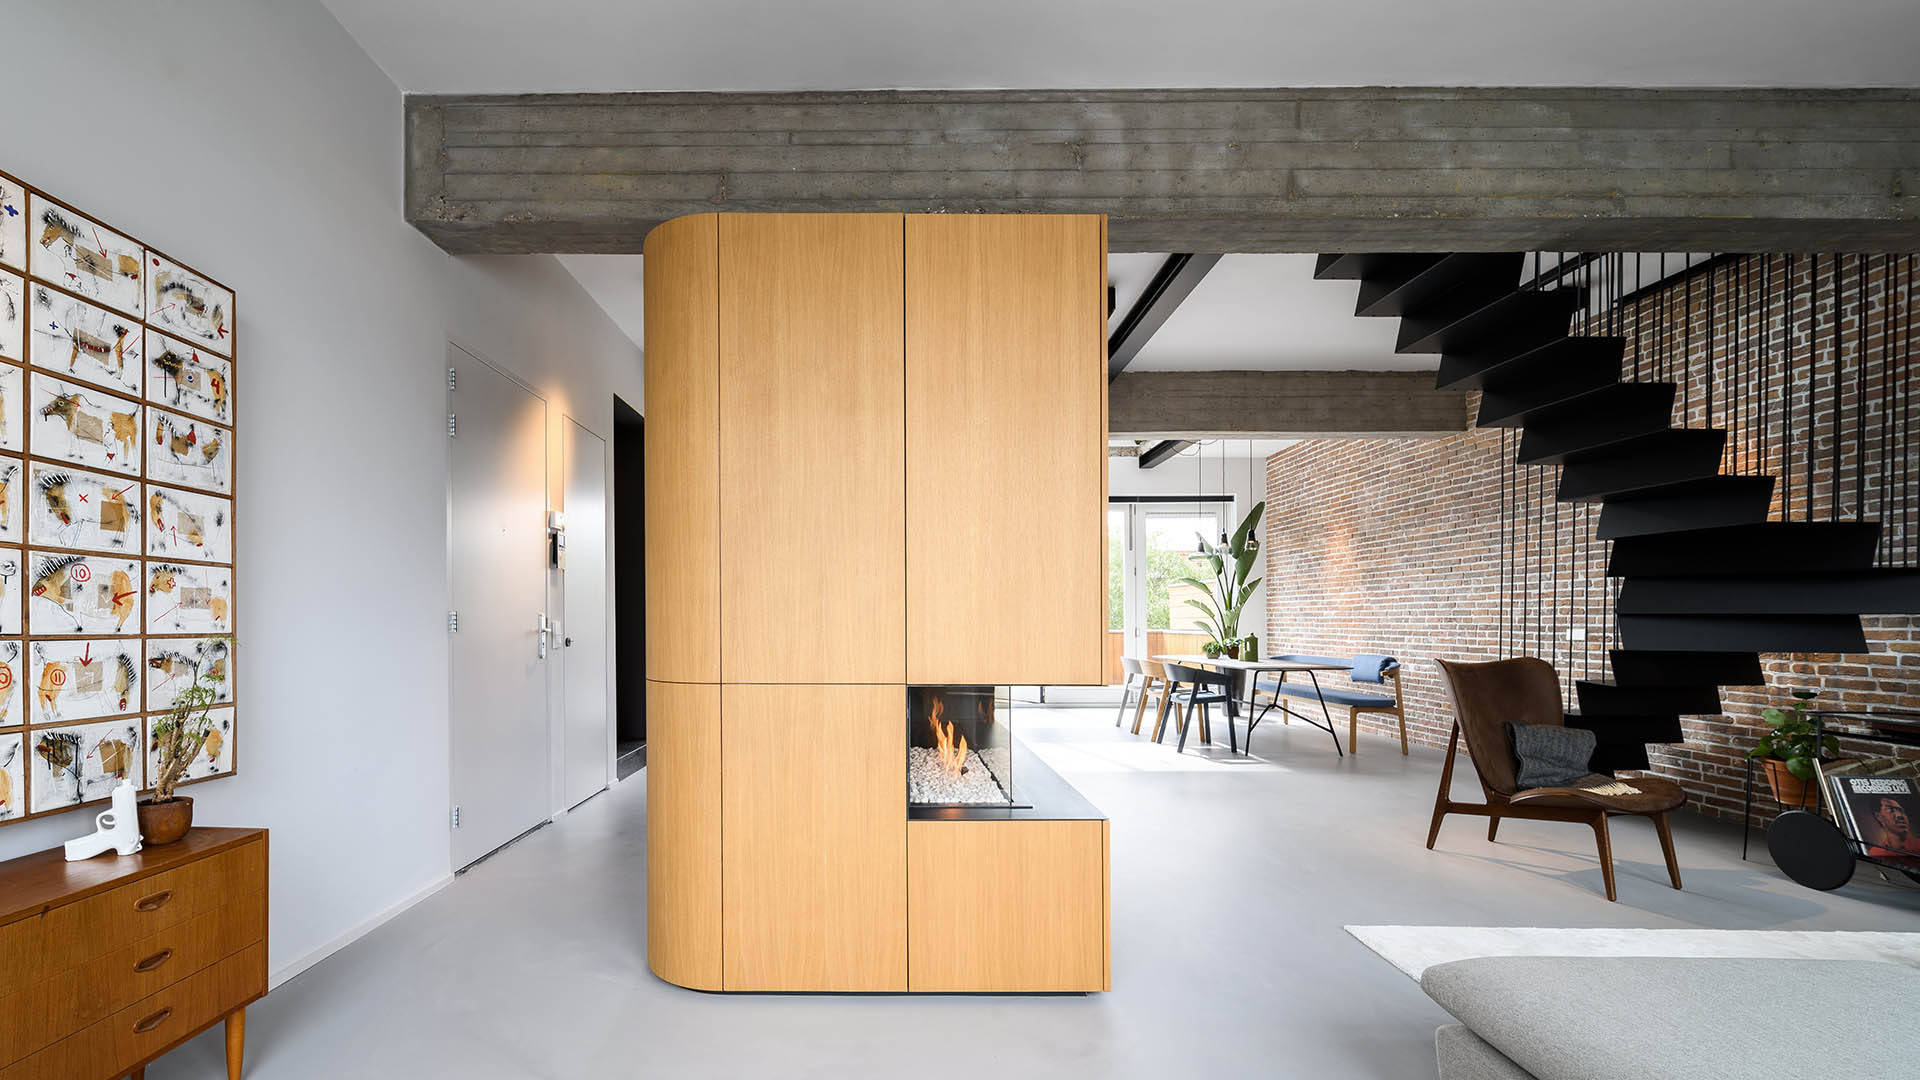 EVA architecten Rotterdam Coolhaven 01